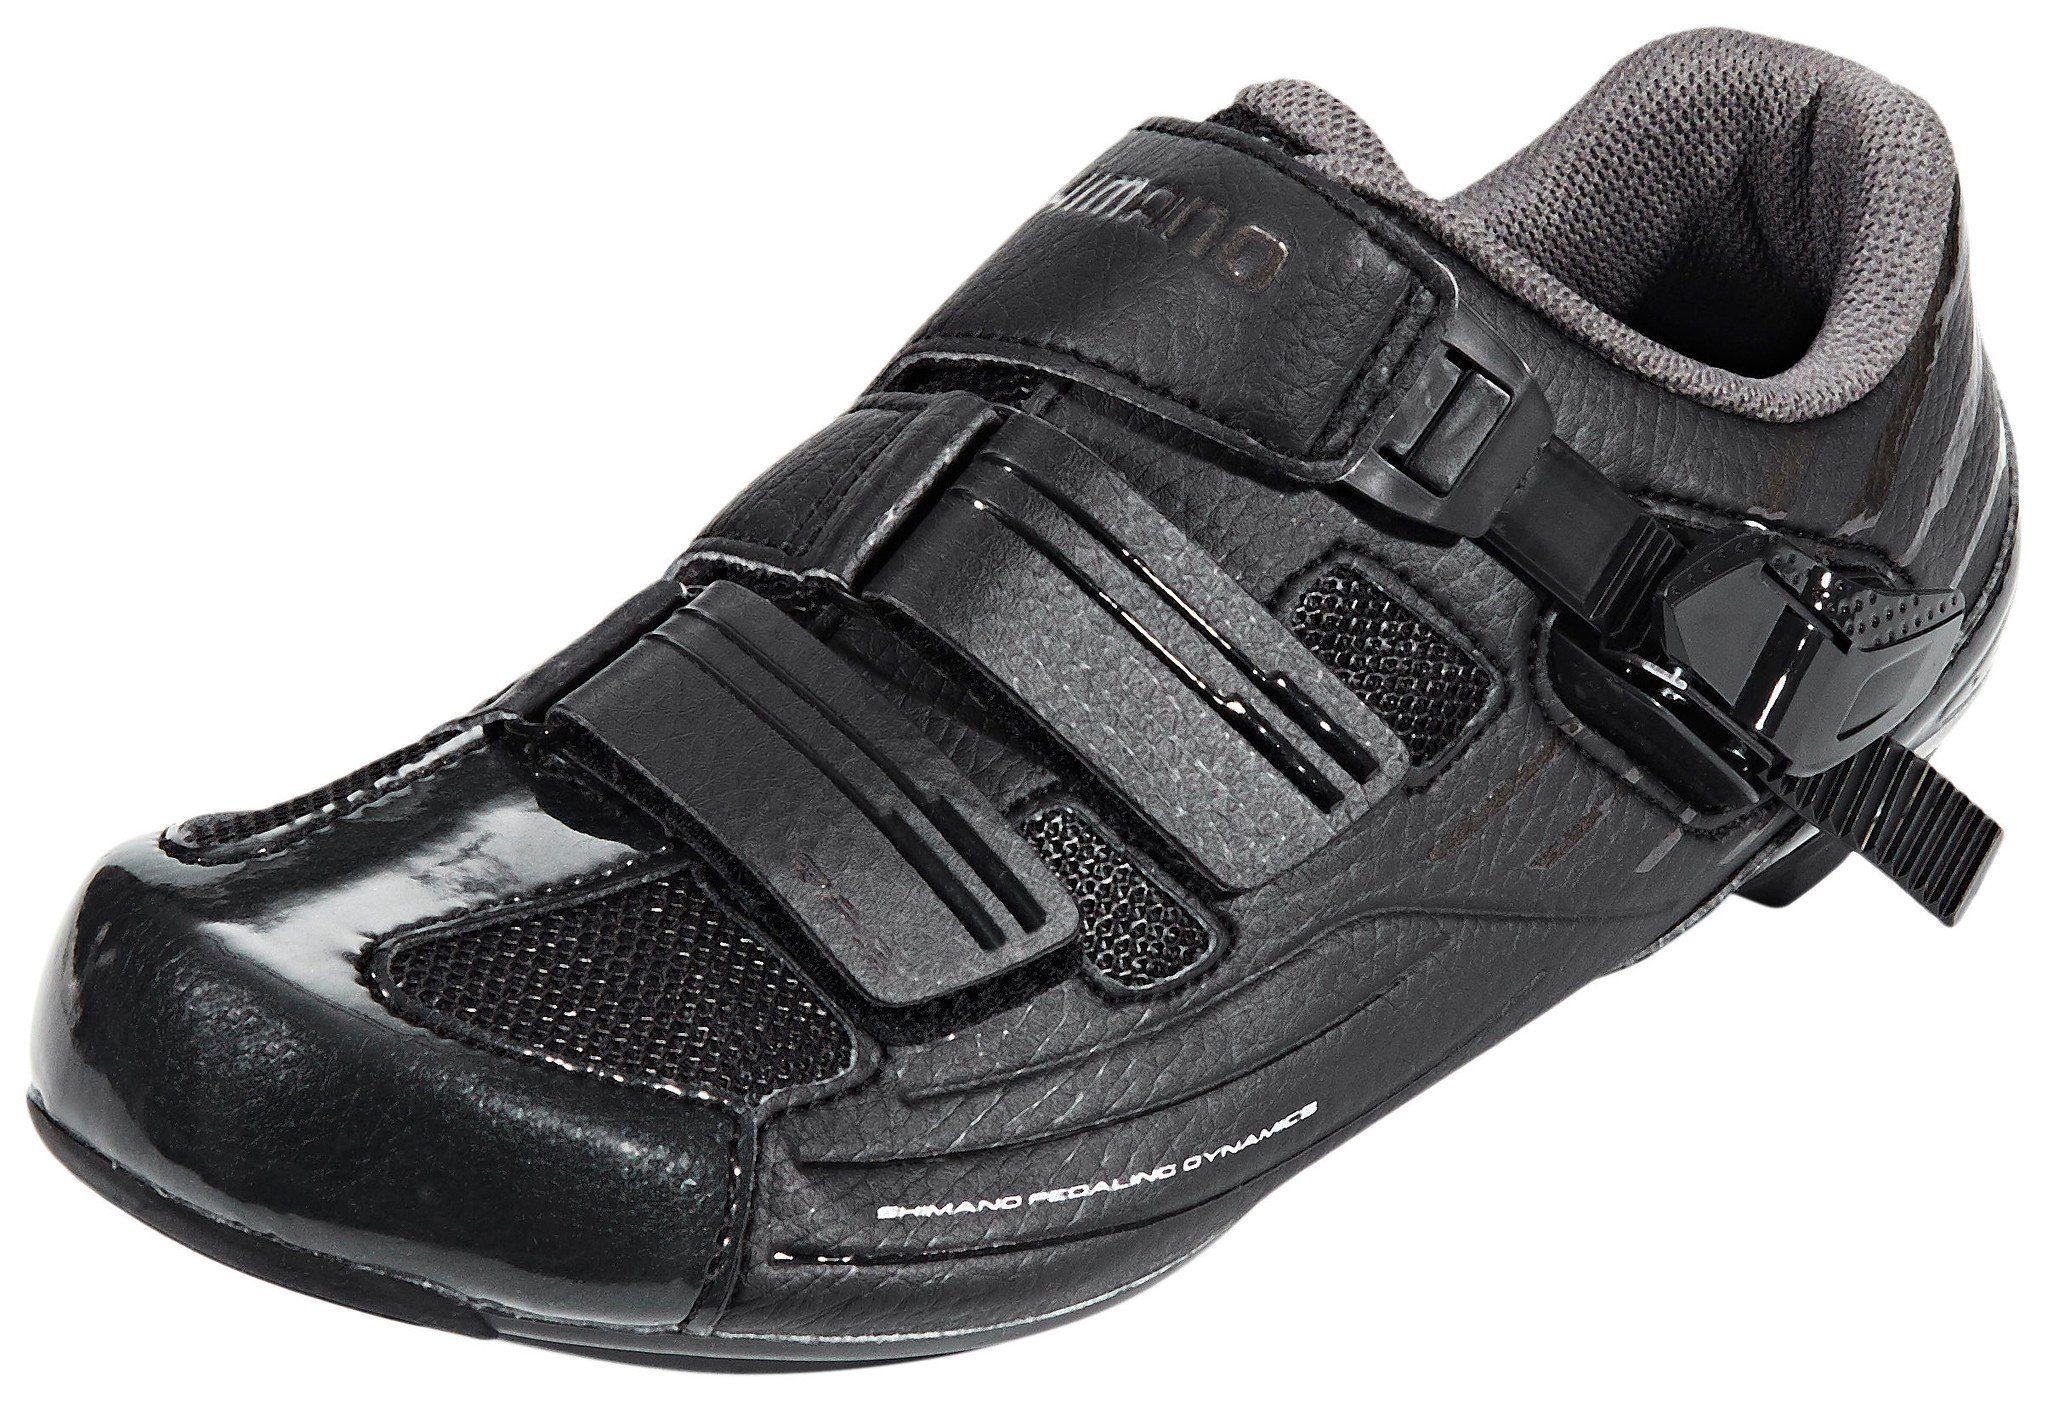 Shimano Fahrradschuhe SH-RP3L Schuhe Unisex  schwarz